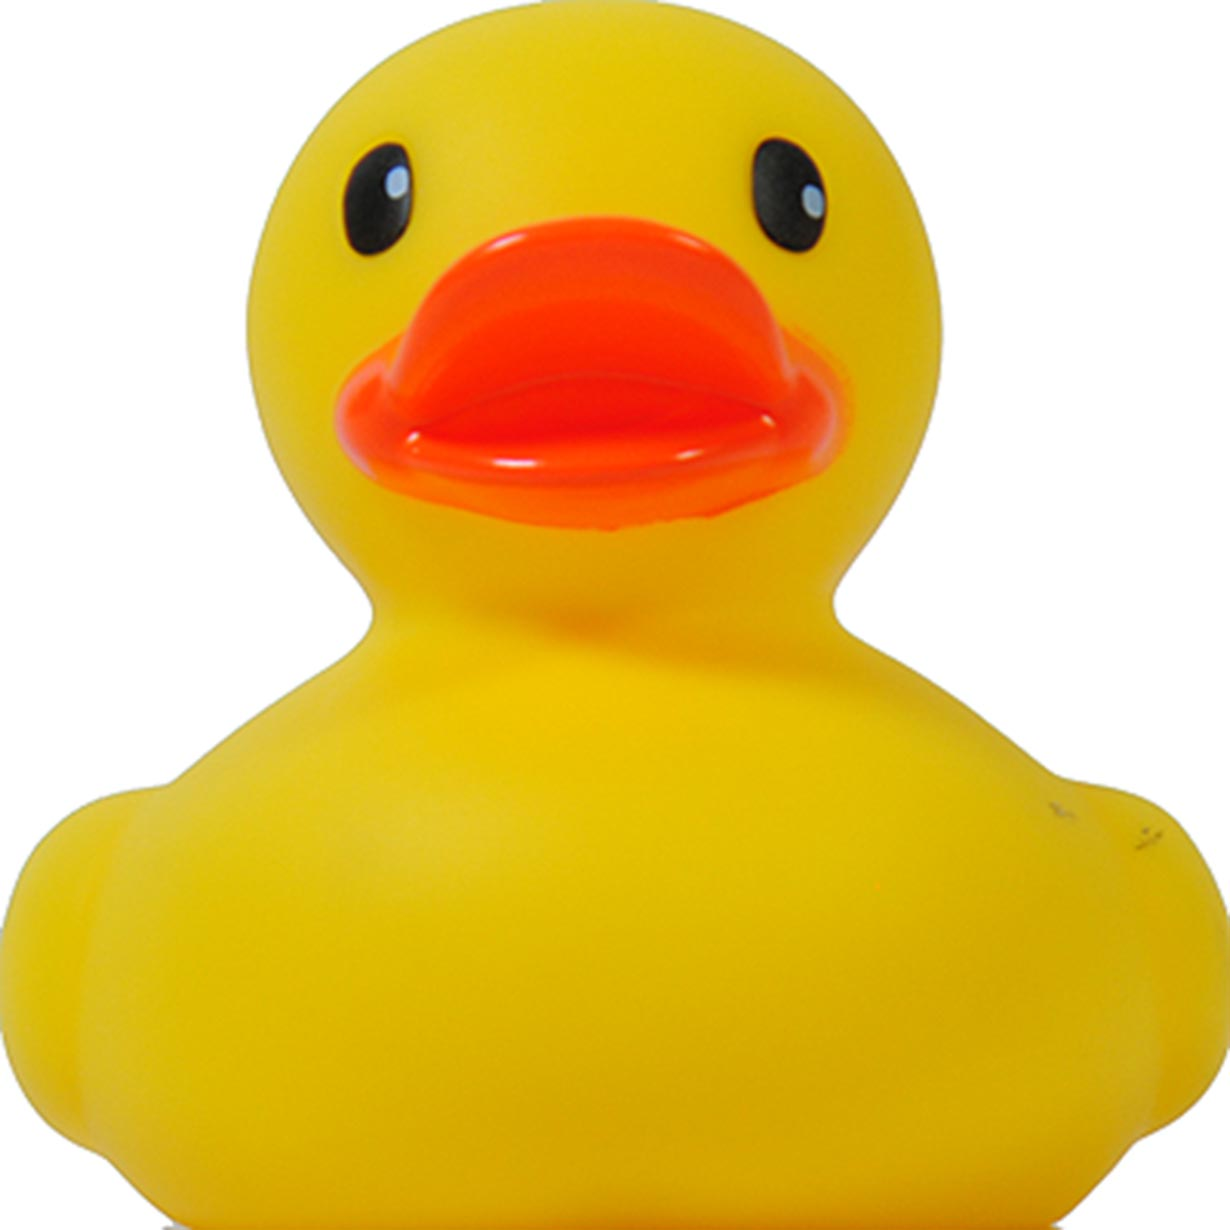 Infantino Rubber Ducky - Walmart.com